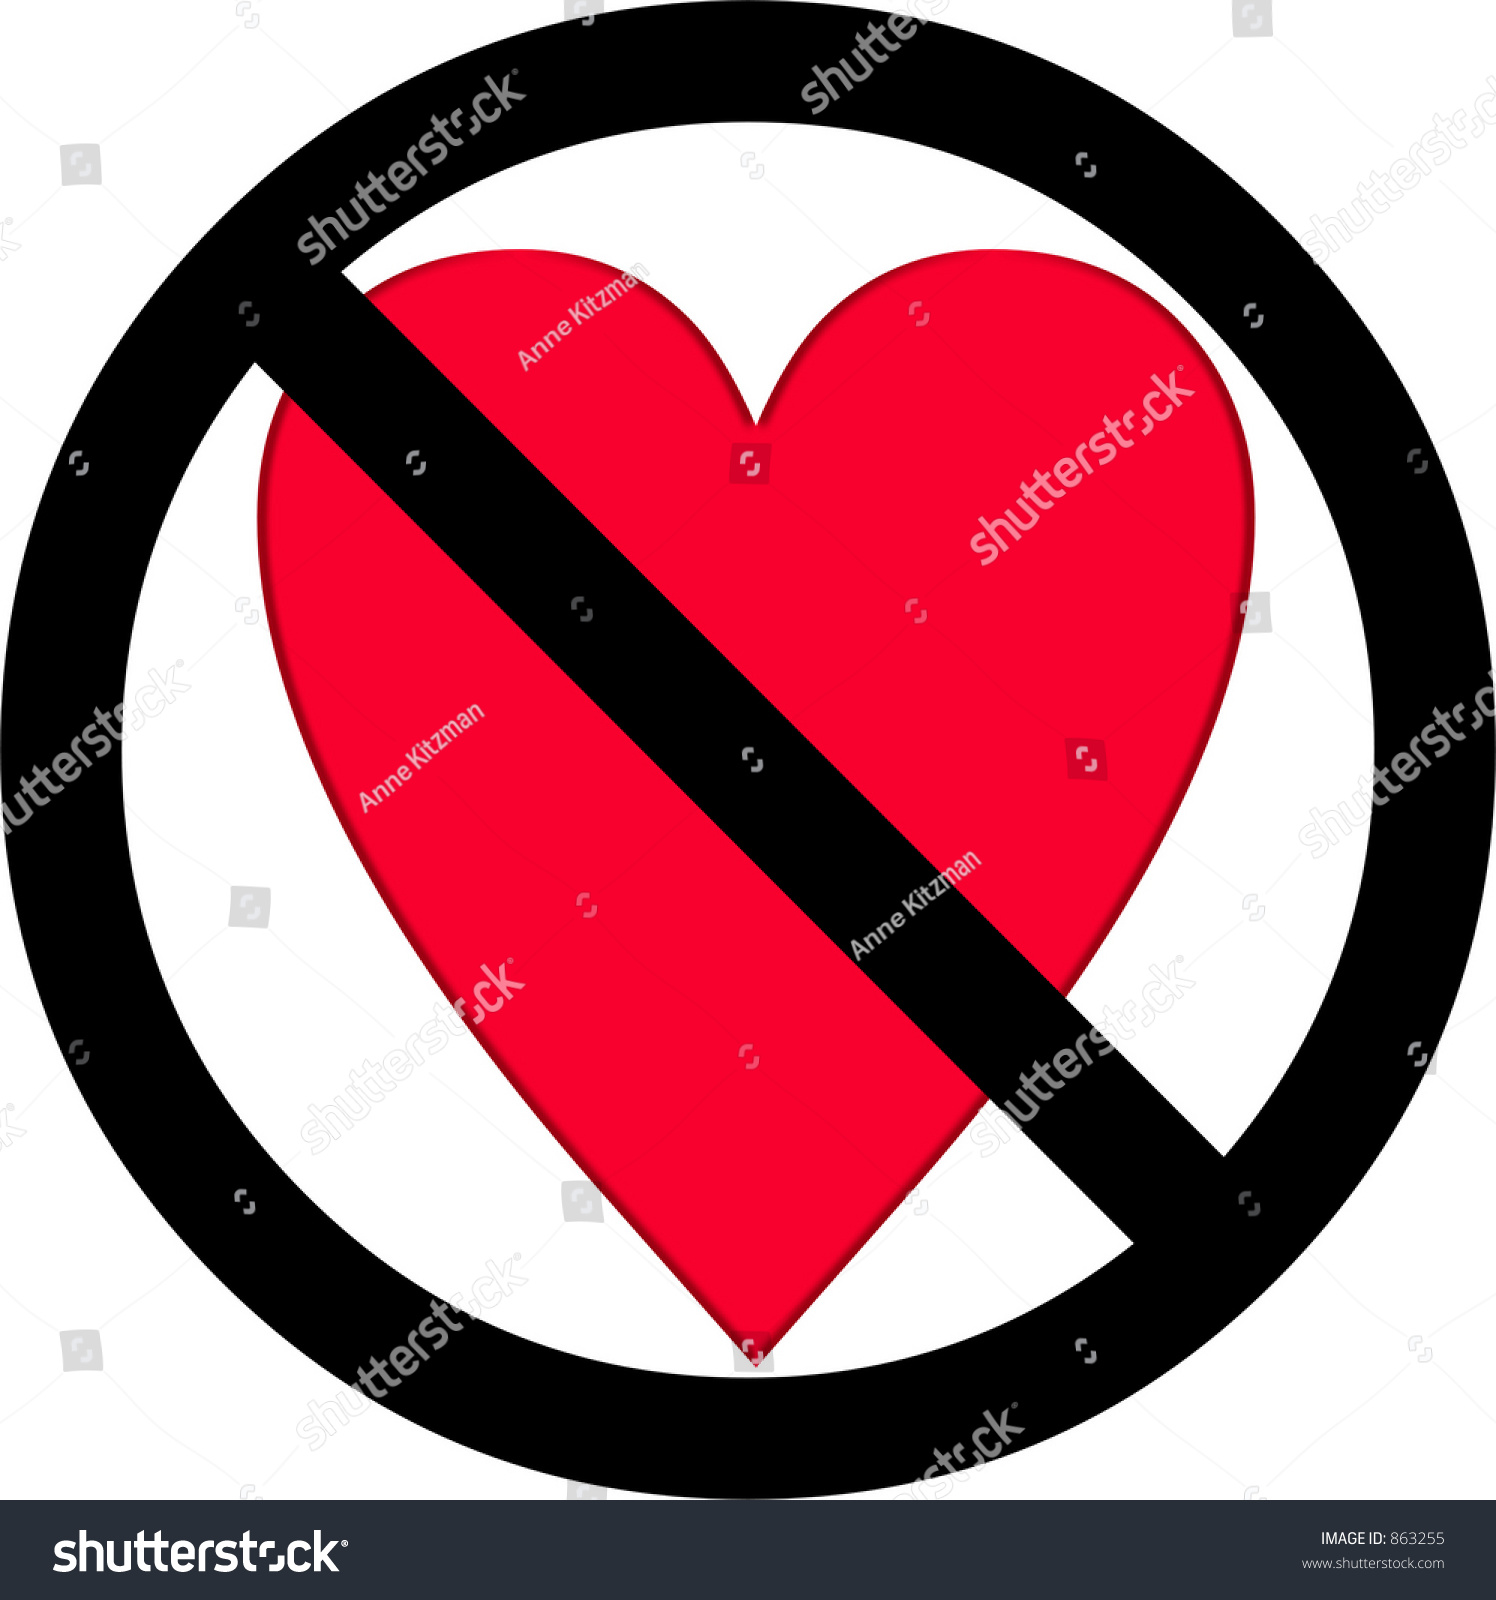 No love symbol stock illustration 863255 shutterstock no love symbol buycottarizona Gallery